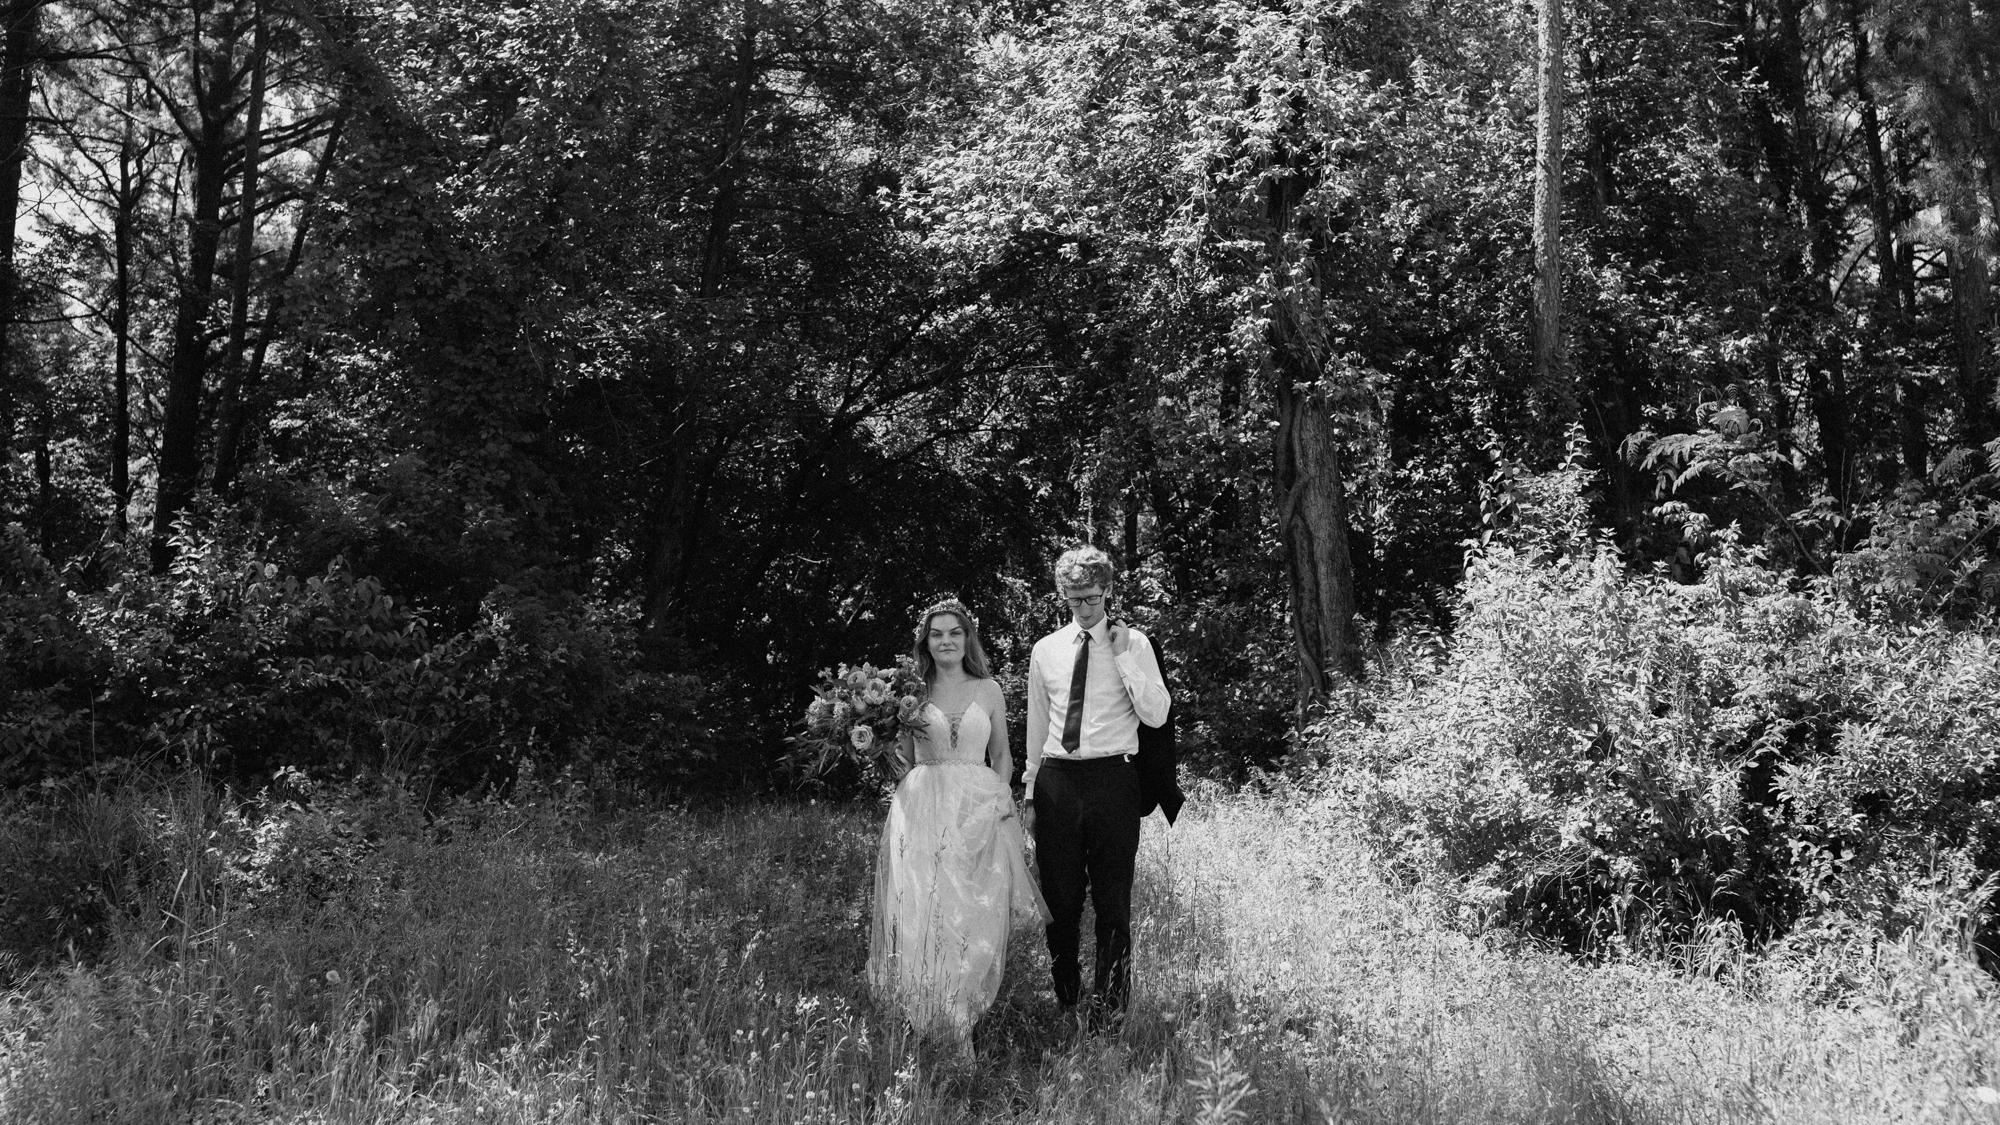 alec_vanderboom_kansas_city_mo_wedding_photos-0092.jpg